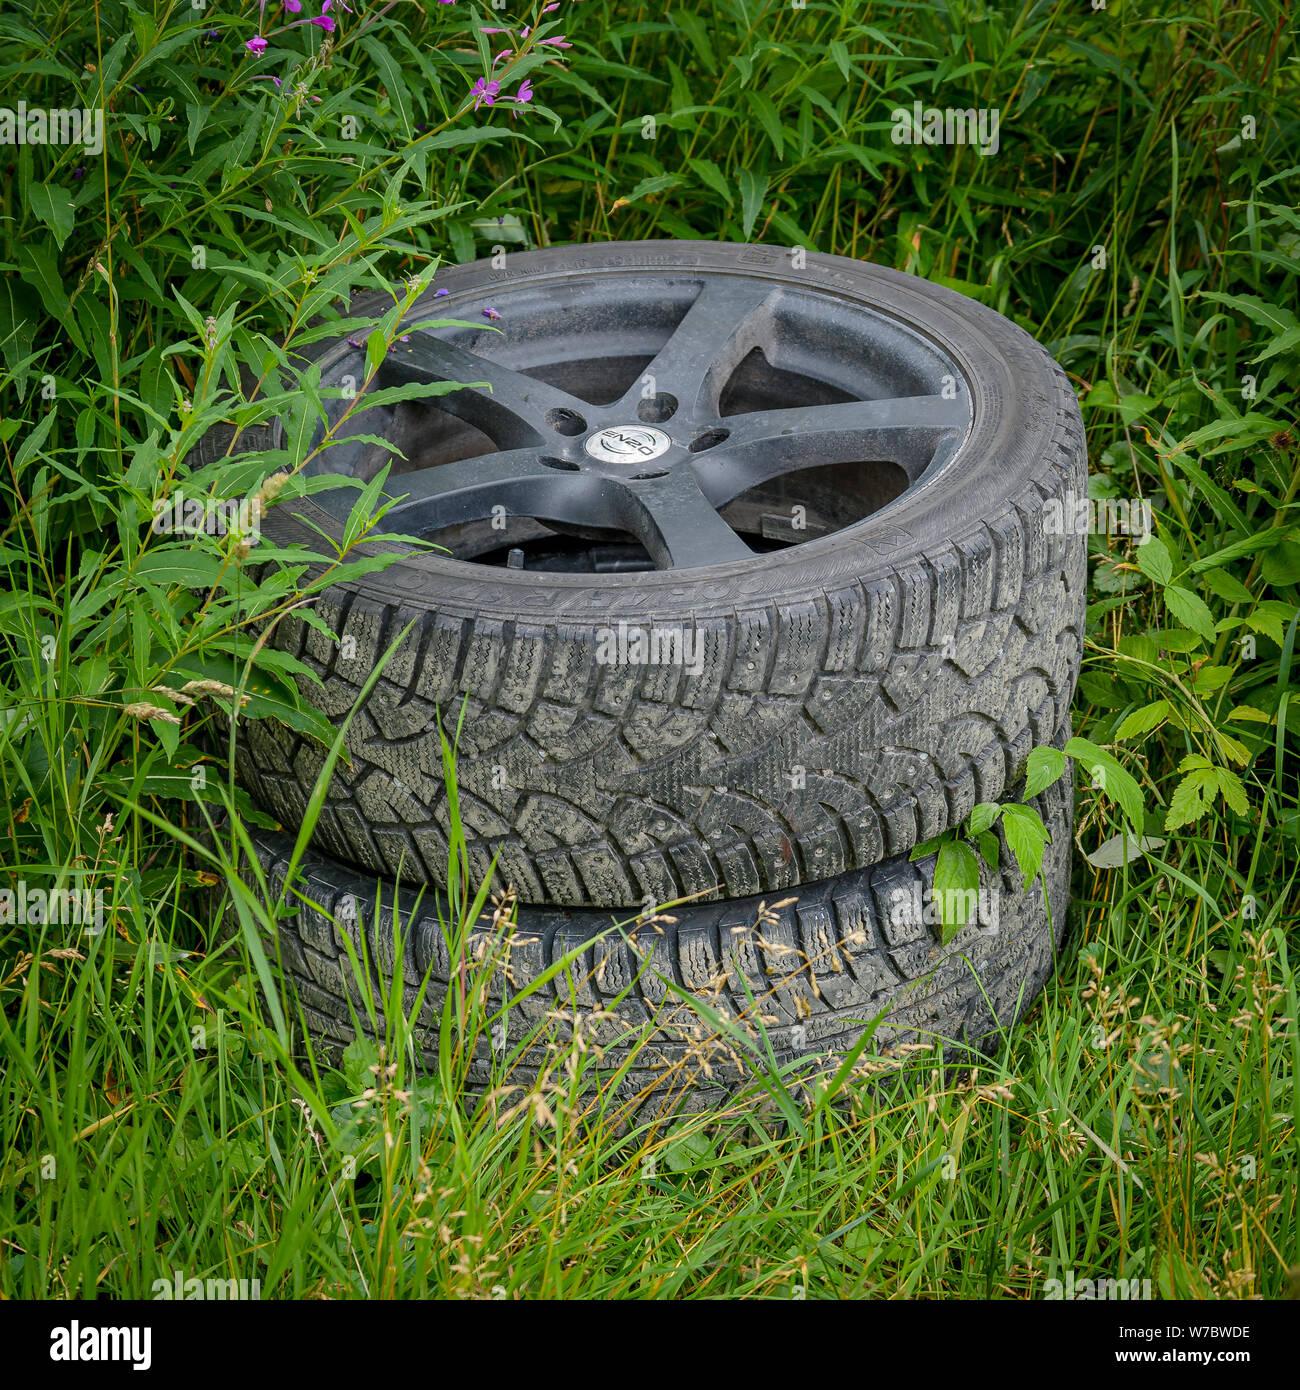 Alloy Wheels Stock Photos & Alloy Wheels Stock Images - Alamy